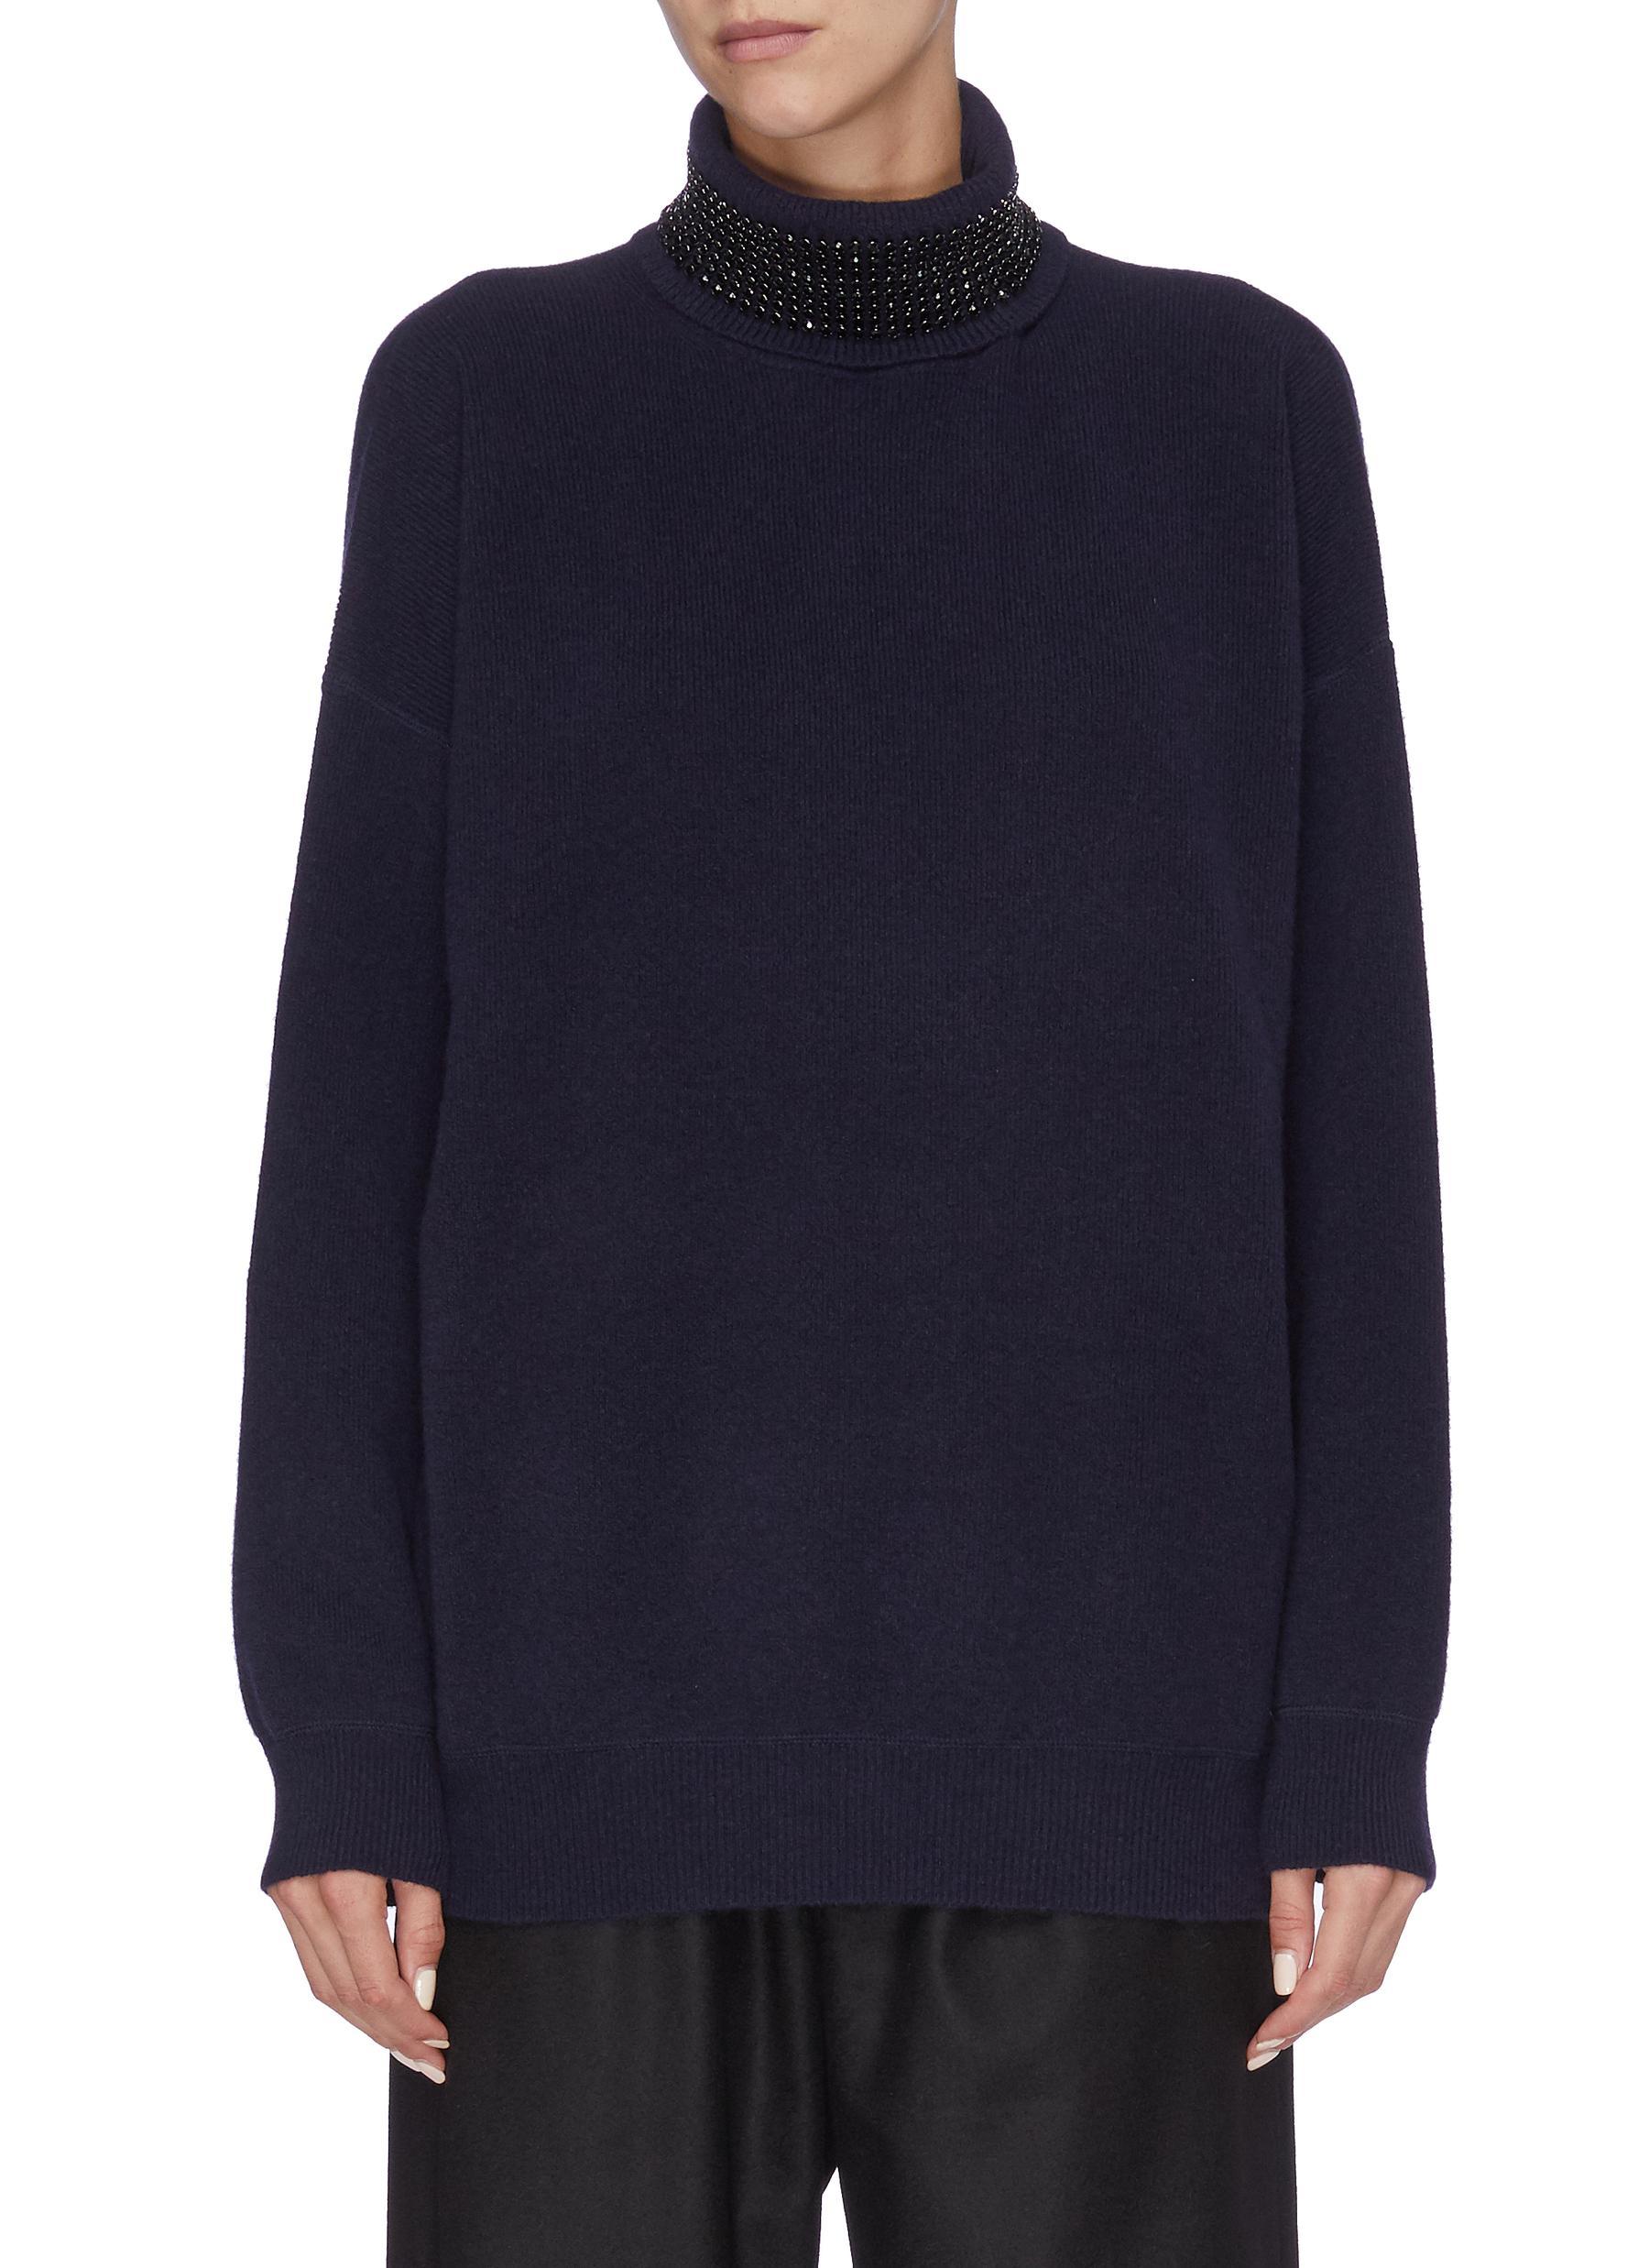 Strass embellished turtleneck sweater by Alexanderwang